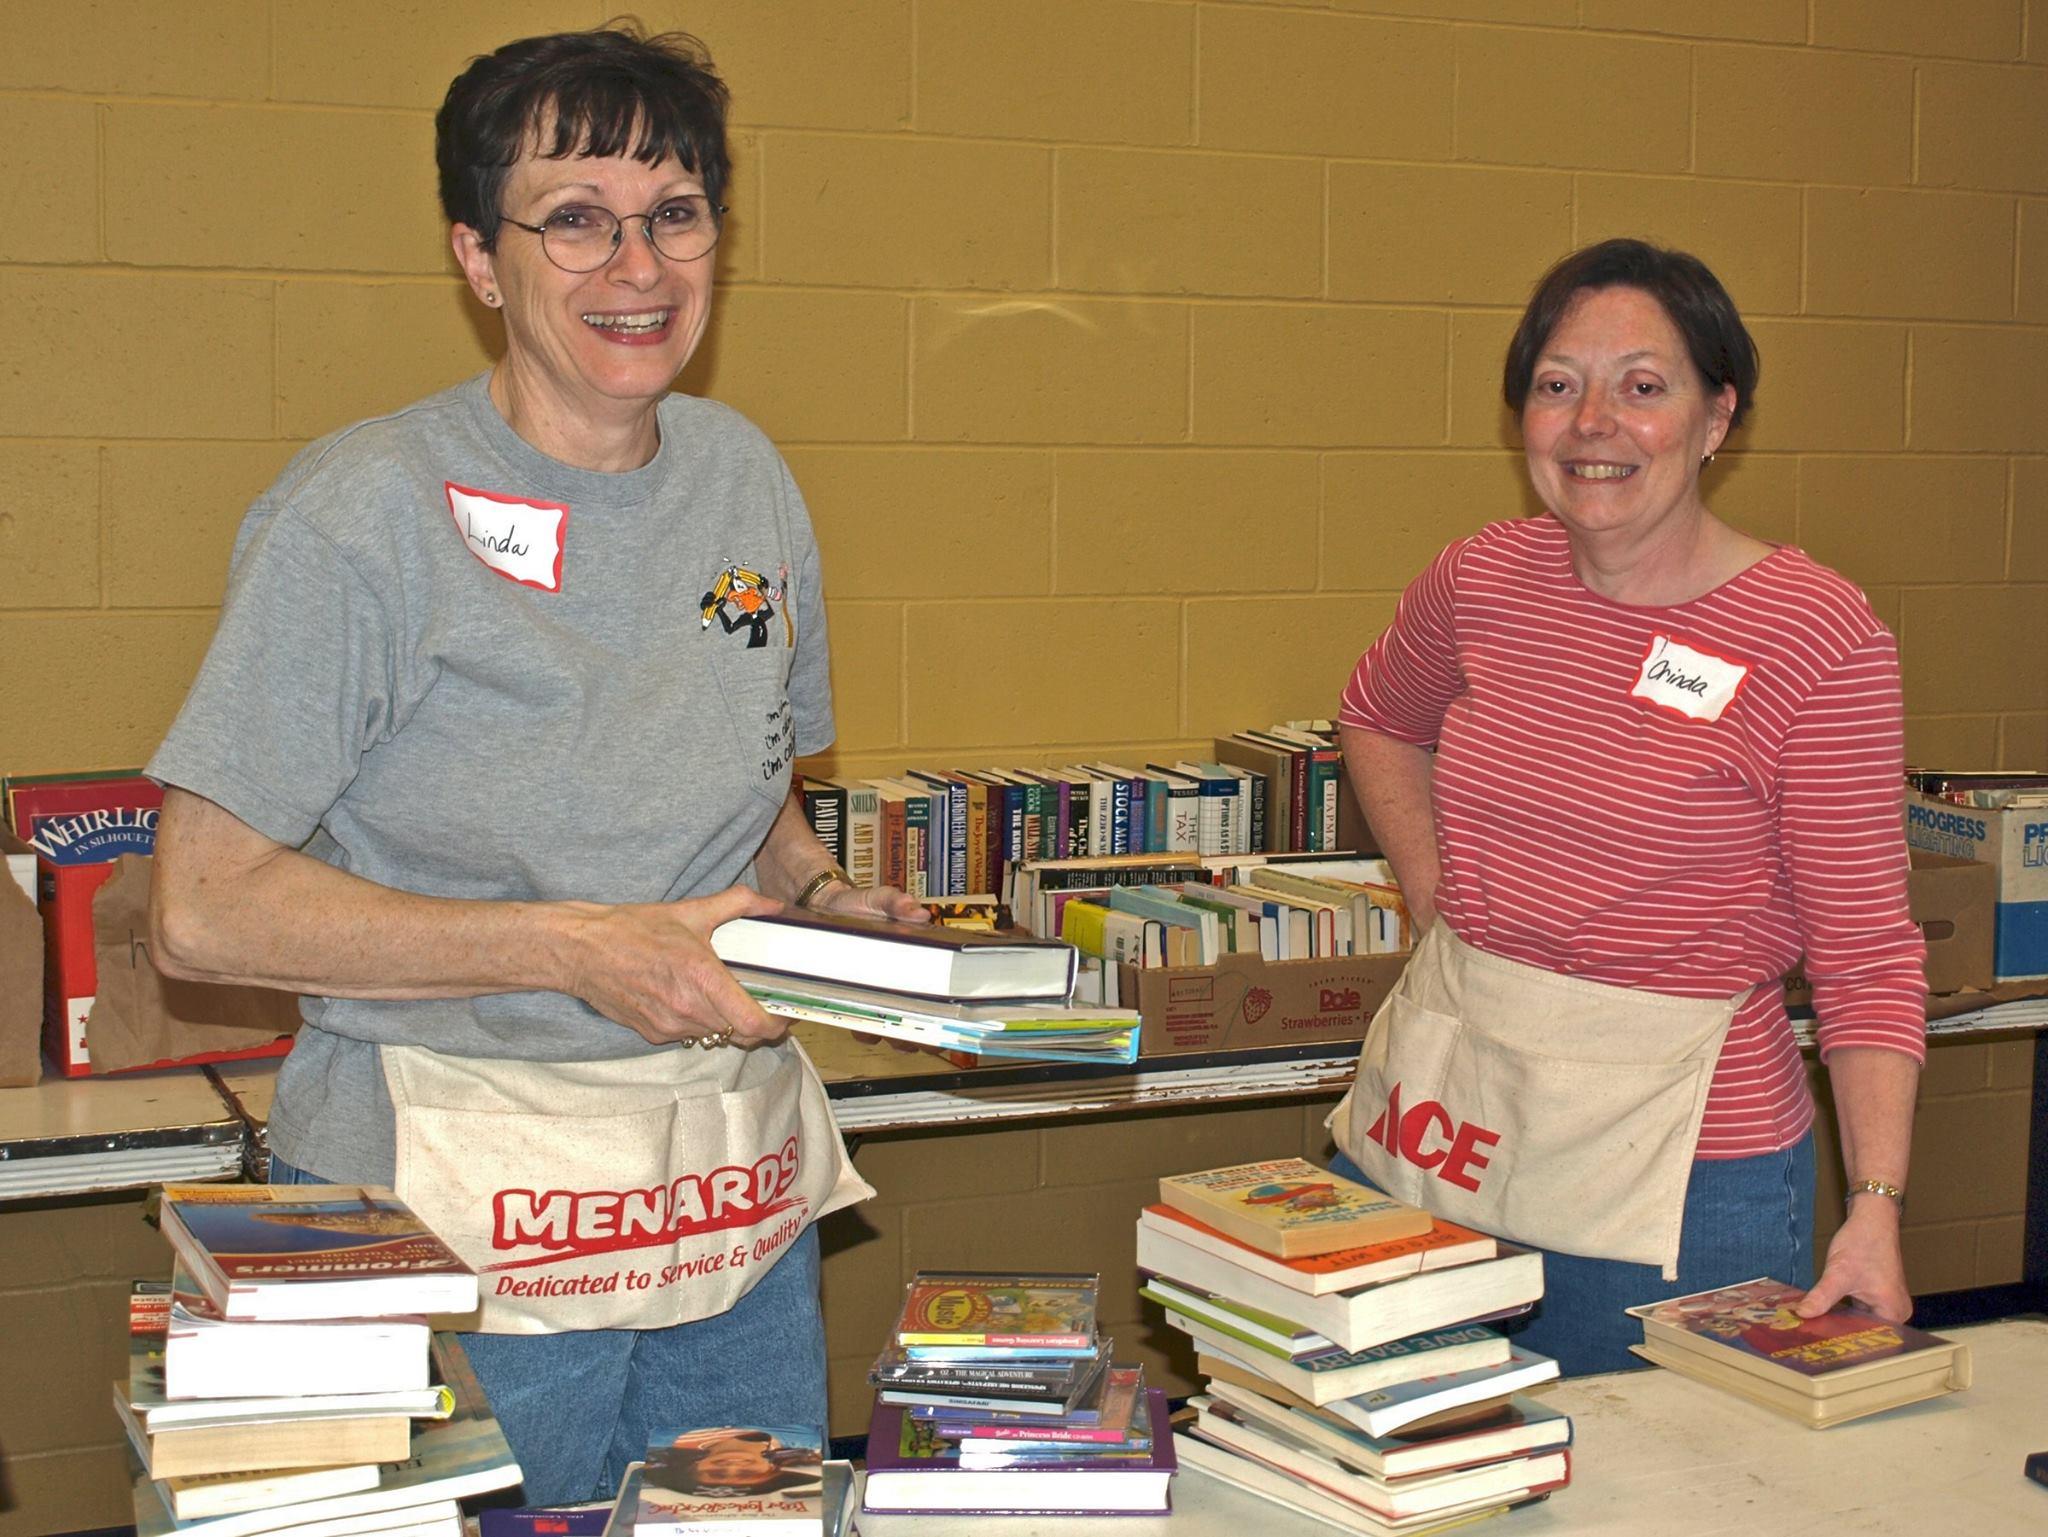 Linda Poehlmann and Orinda Prell